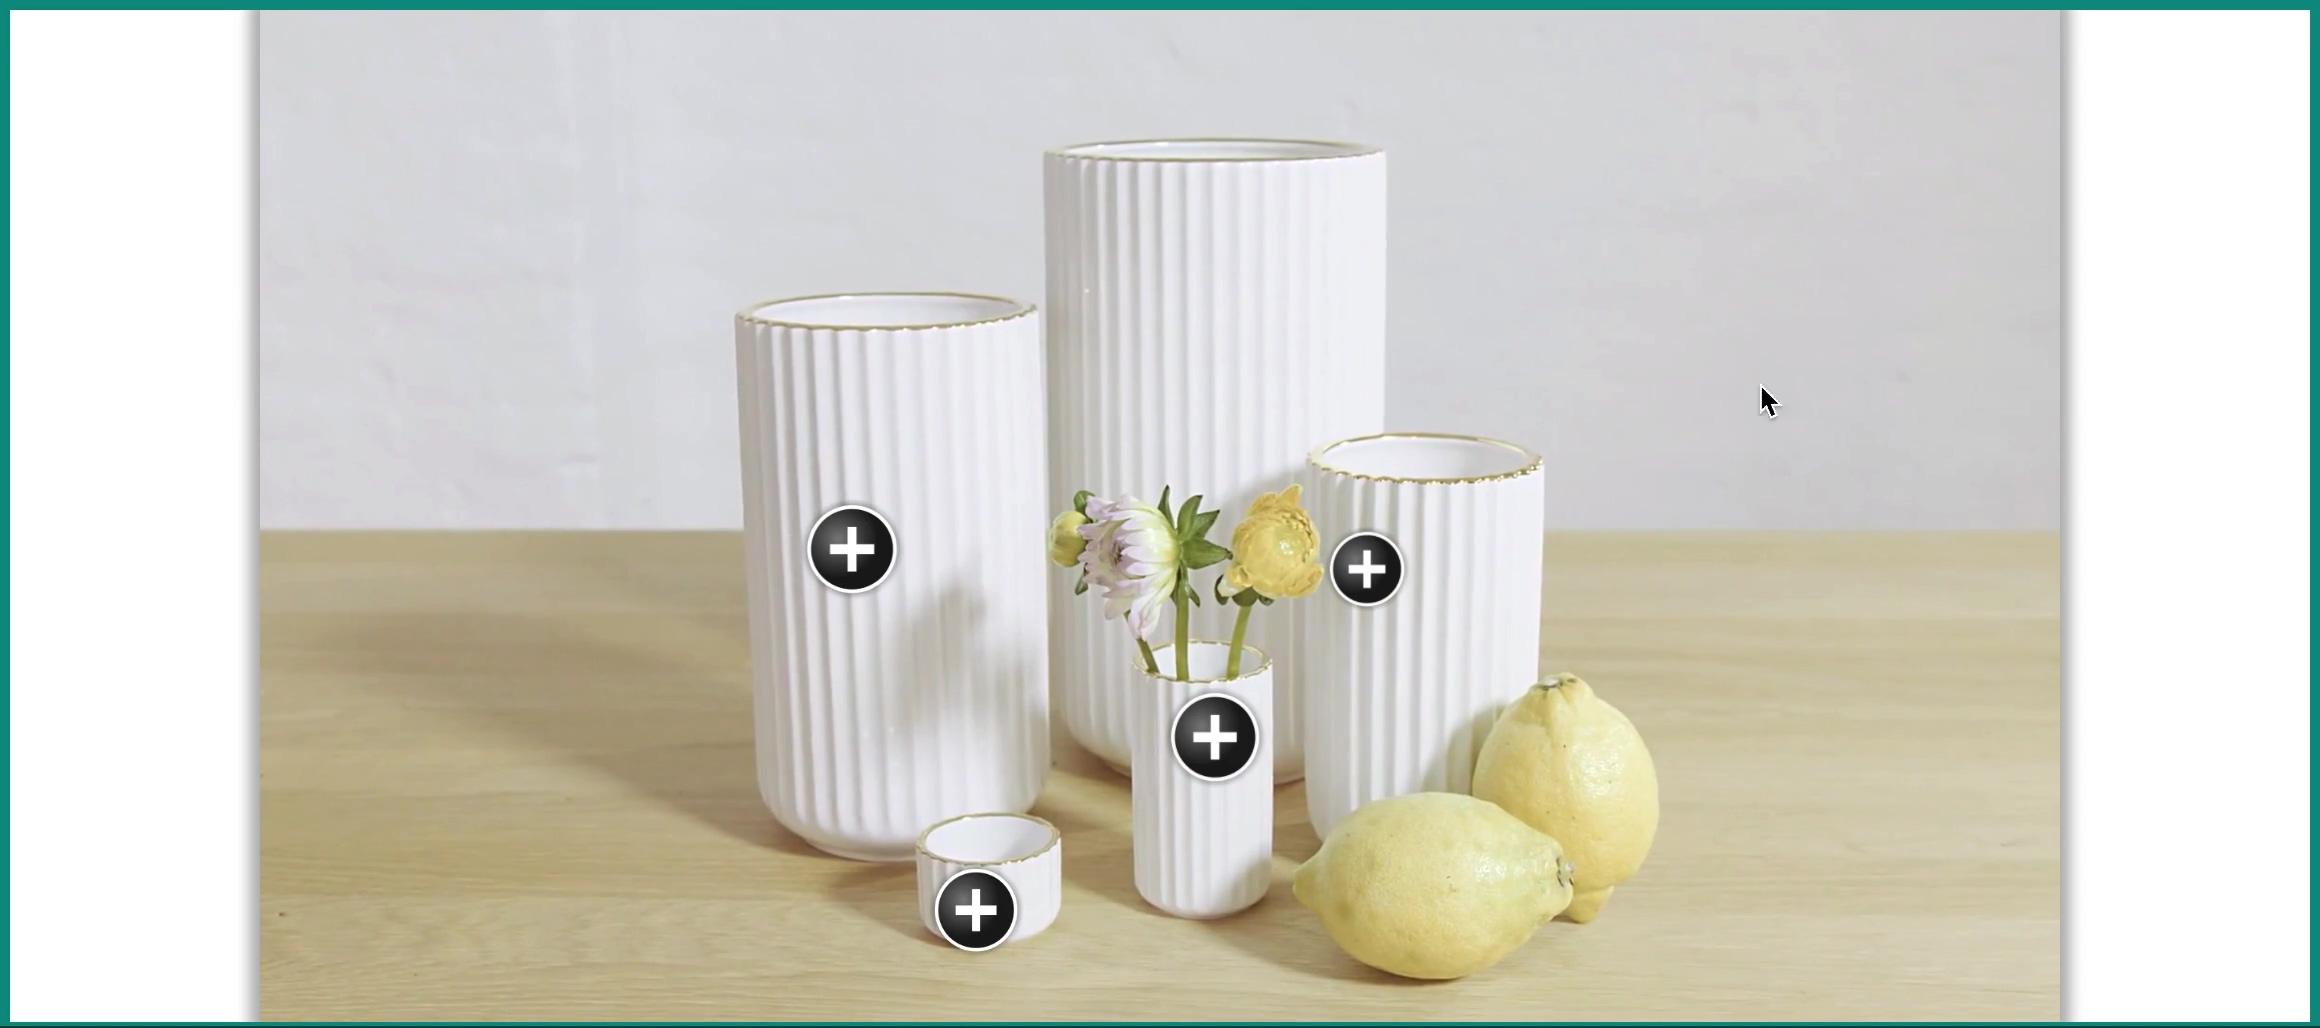 vases-shoppable-video-example-vmg-studios